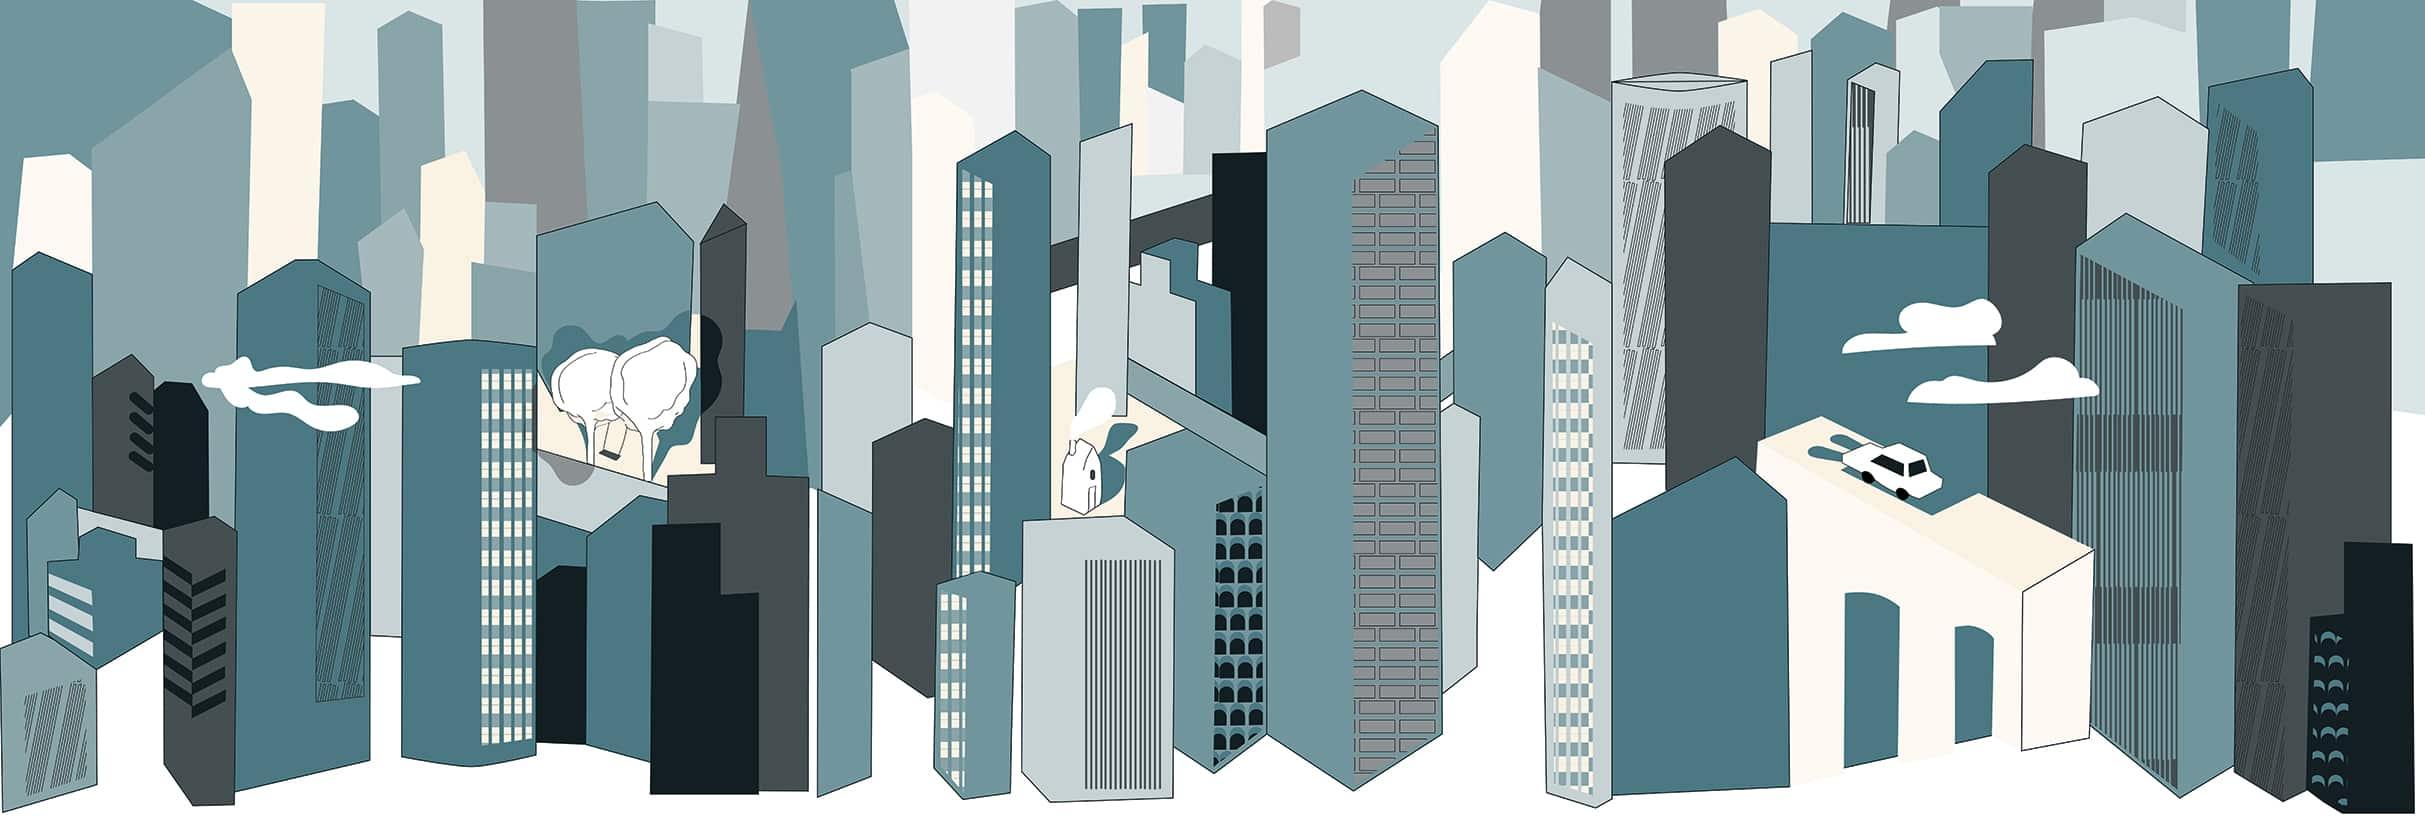 Design by ludovica + roberto palomba. Metropolis Breeze Design Wallpaper Ambientha